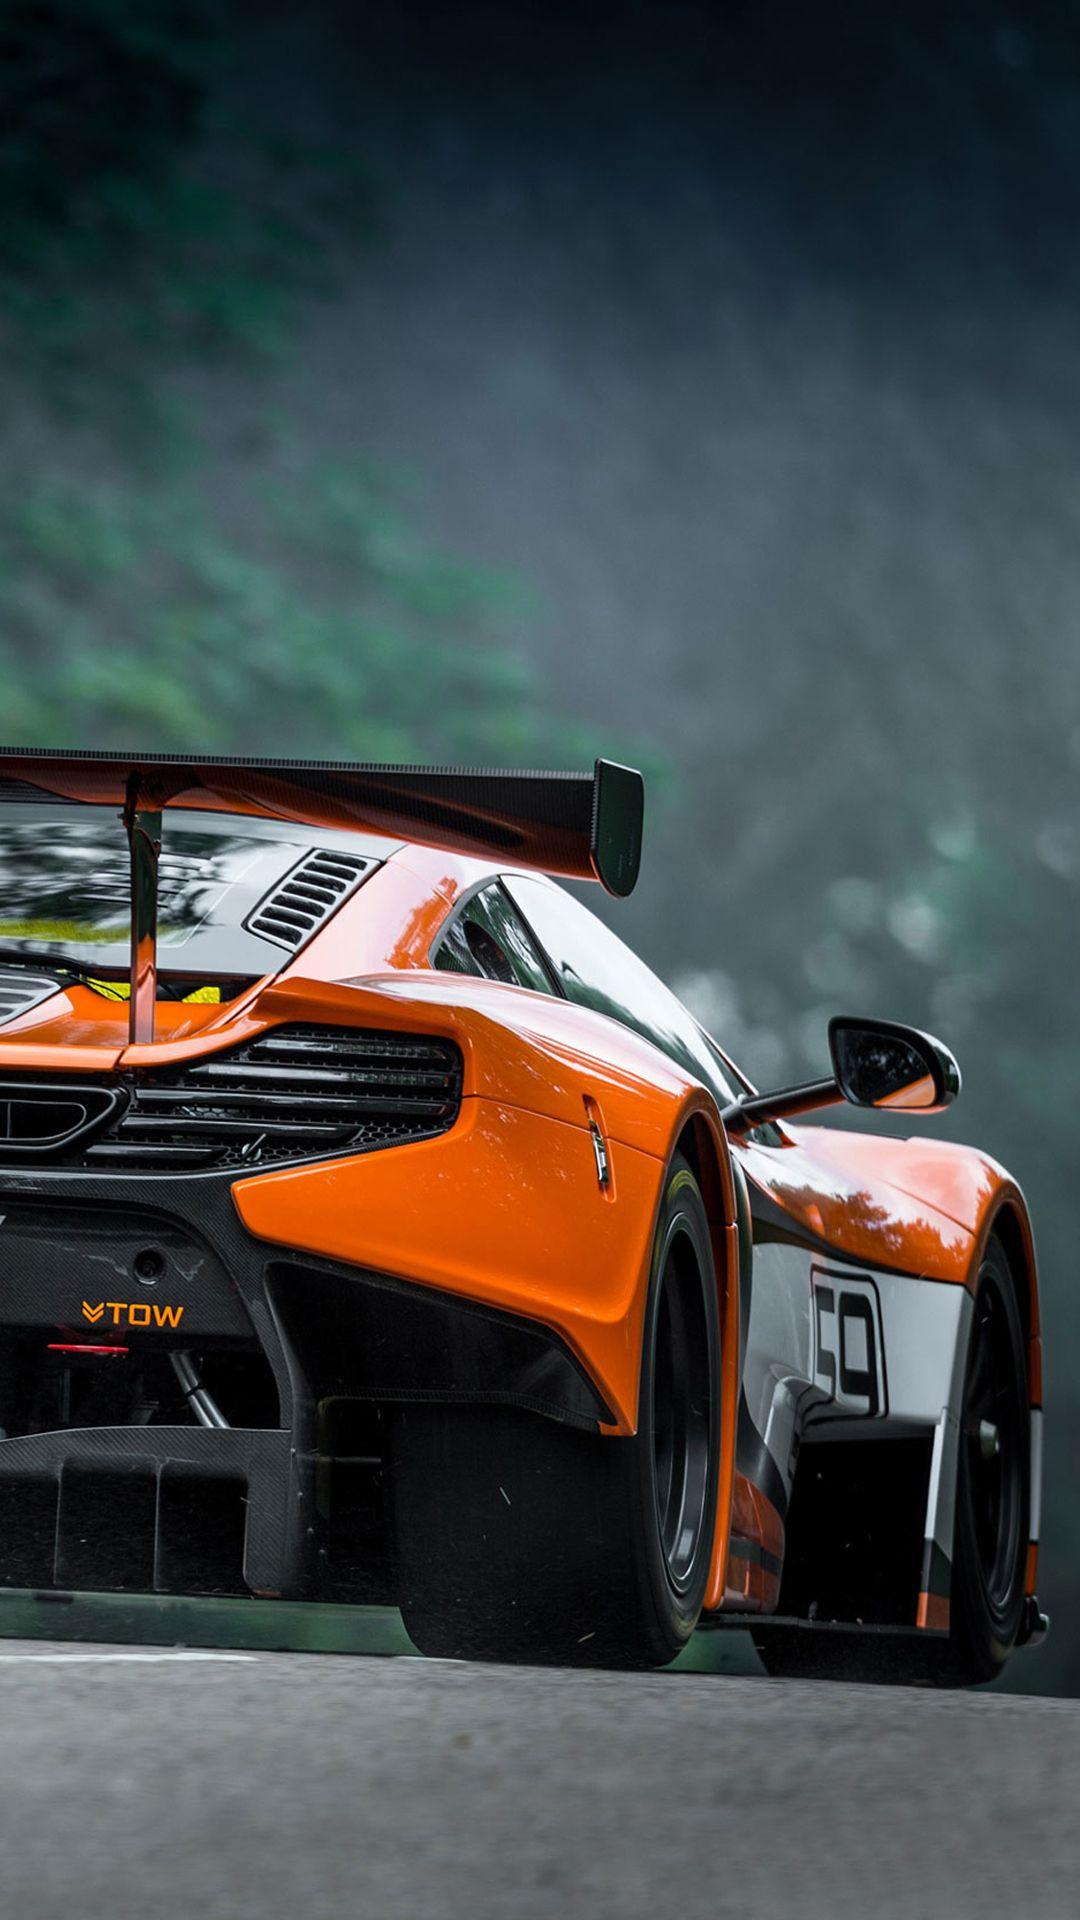 TAP AND GET THE FREE APP! Men's World McLaren Orange Car